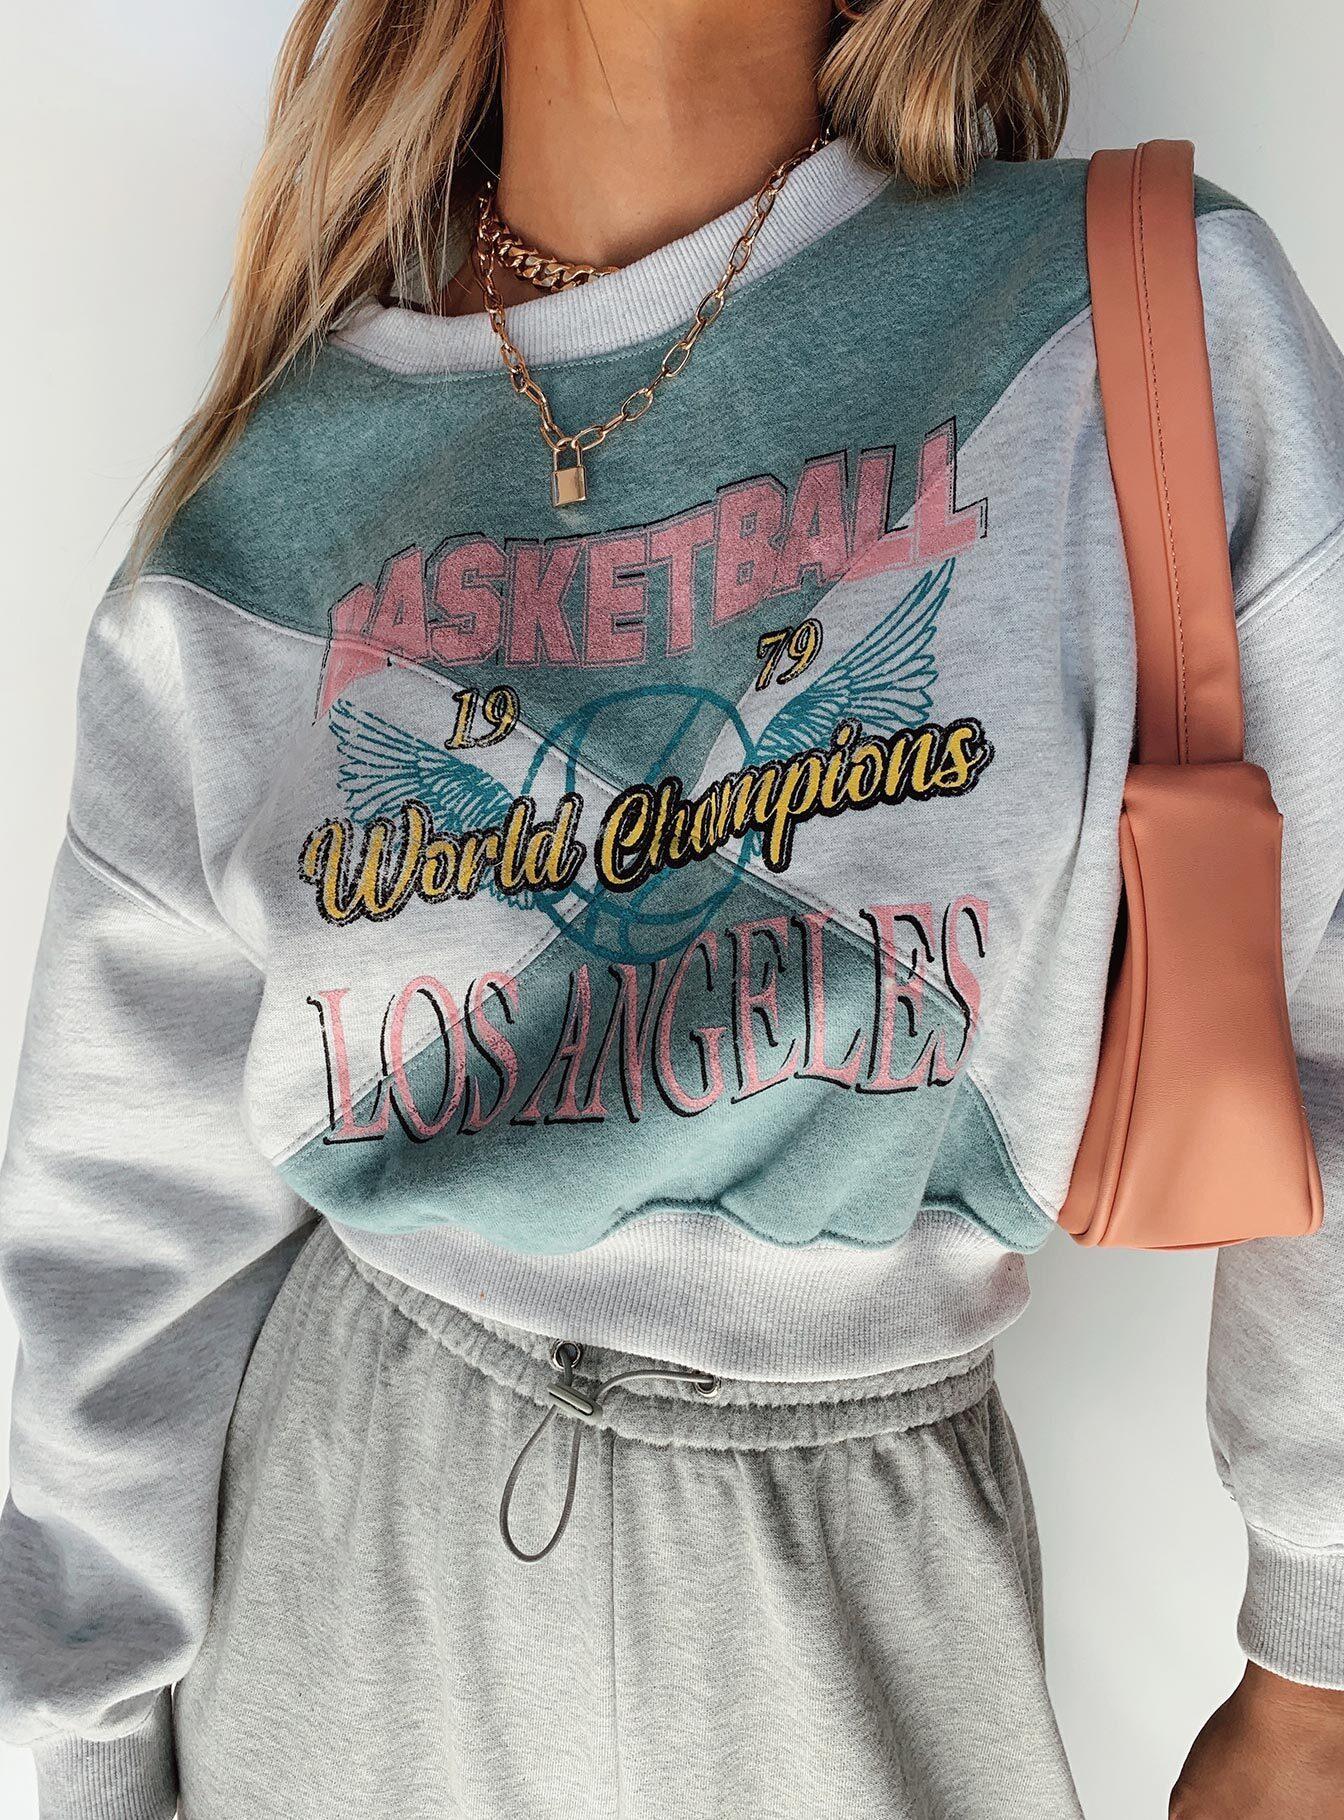 Crewneck Sweaters & Sweatshirts (Side A)